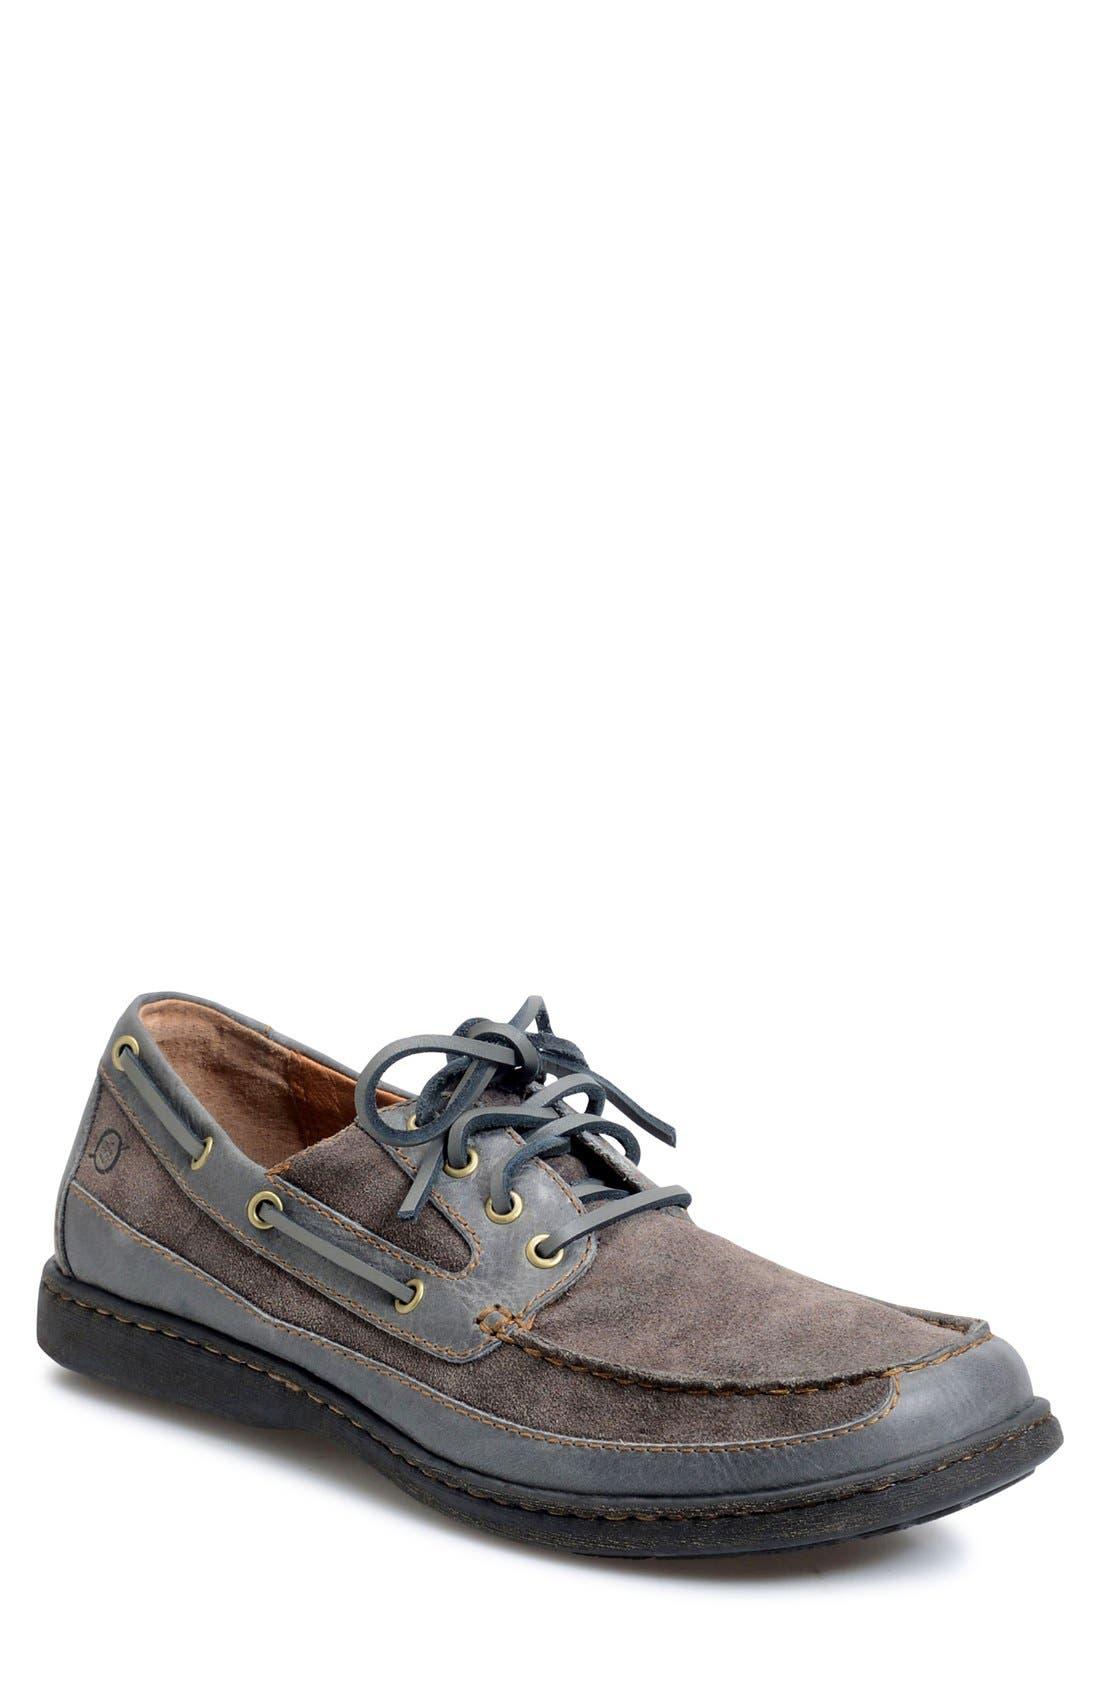 'Harwich' Boat Shoe,                         Main,                         color, 020